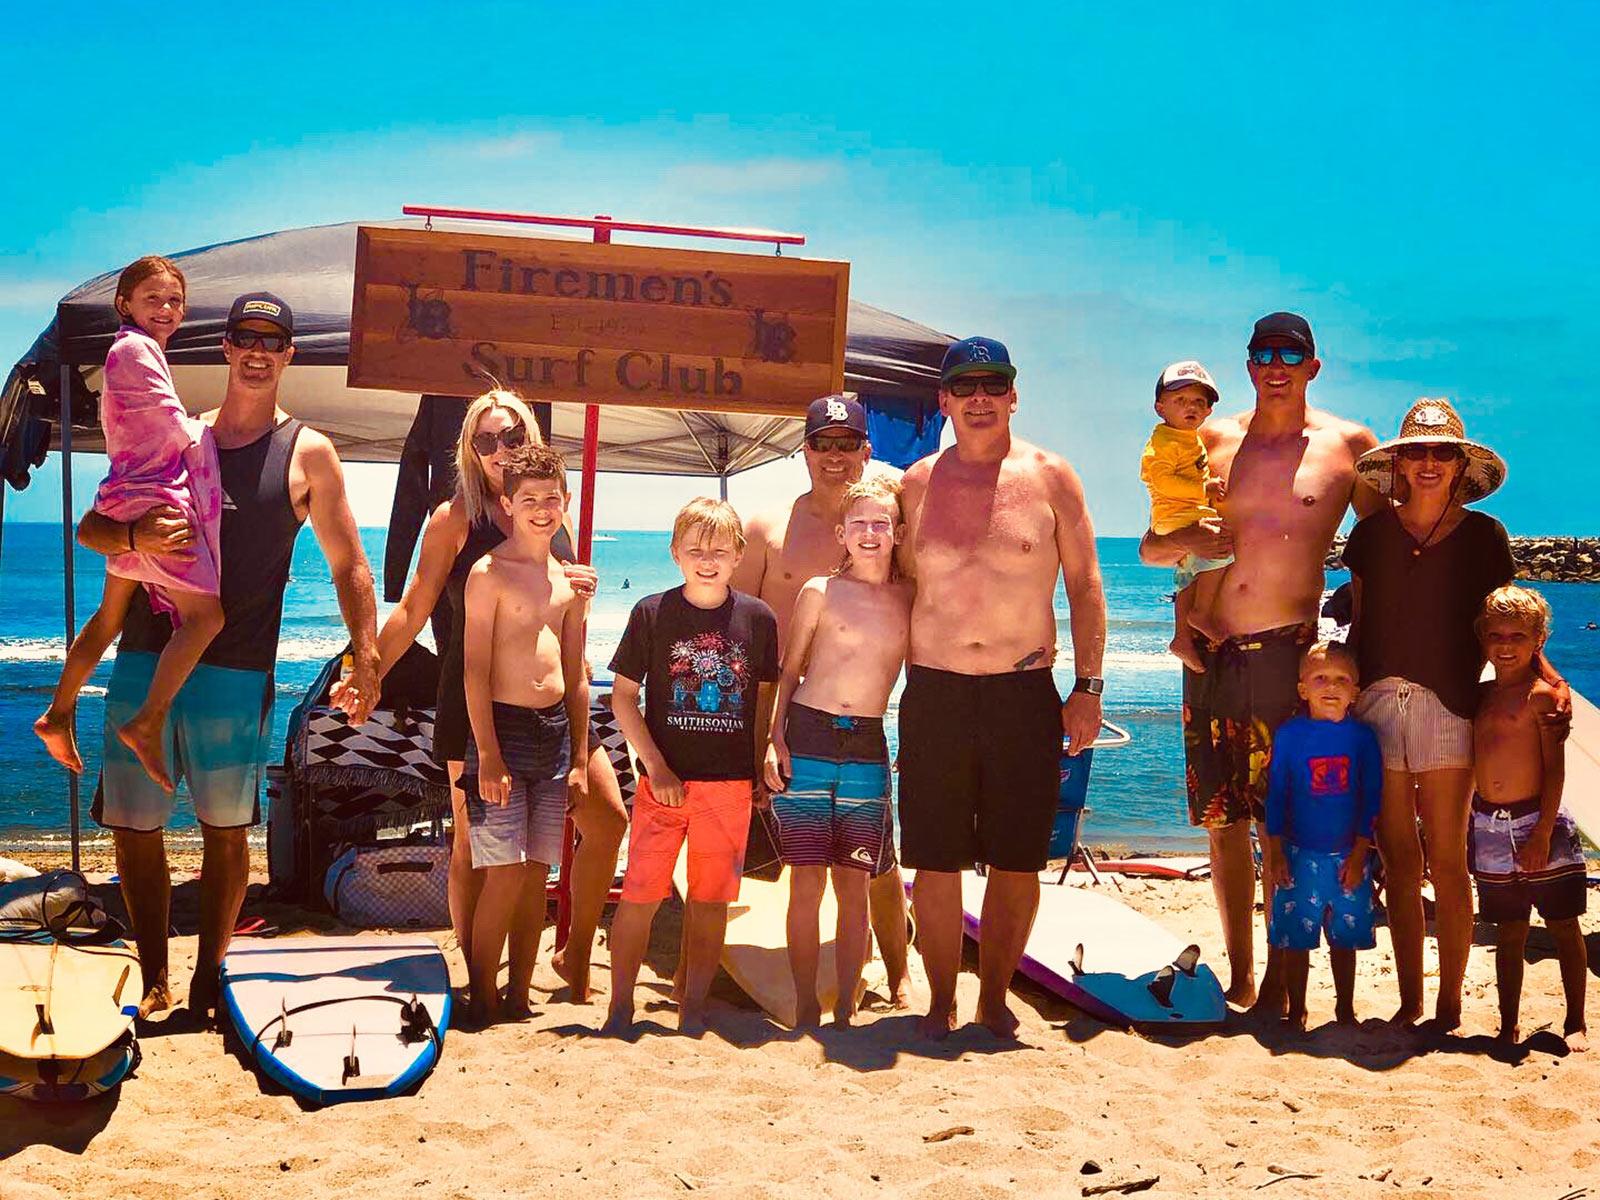 Surf-Club.jpg